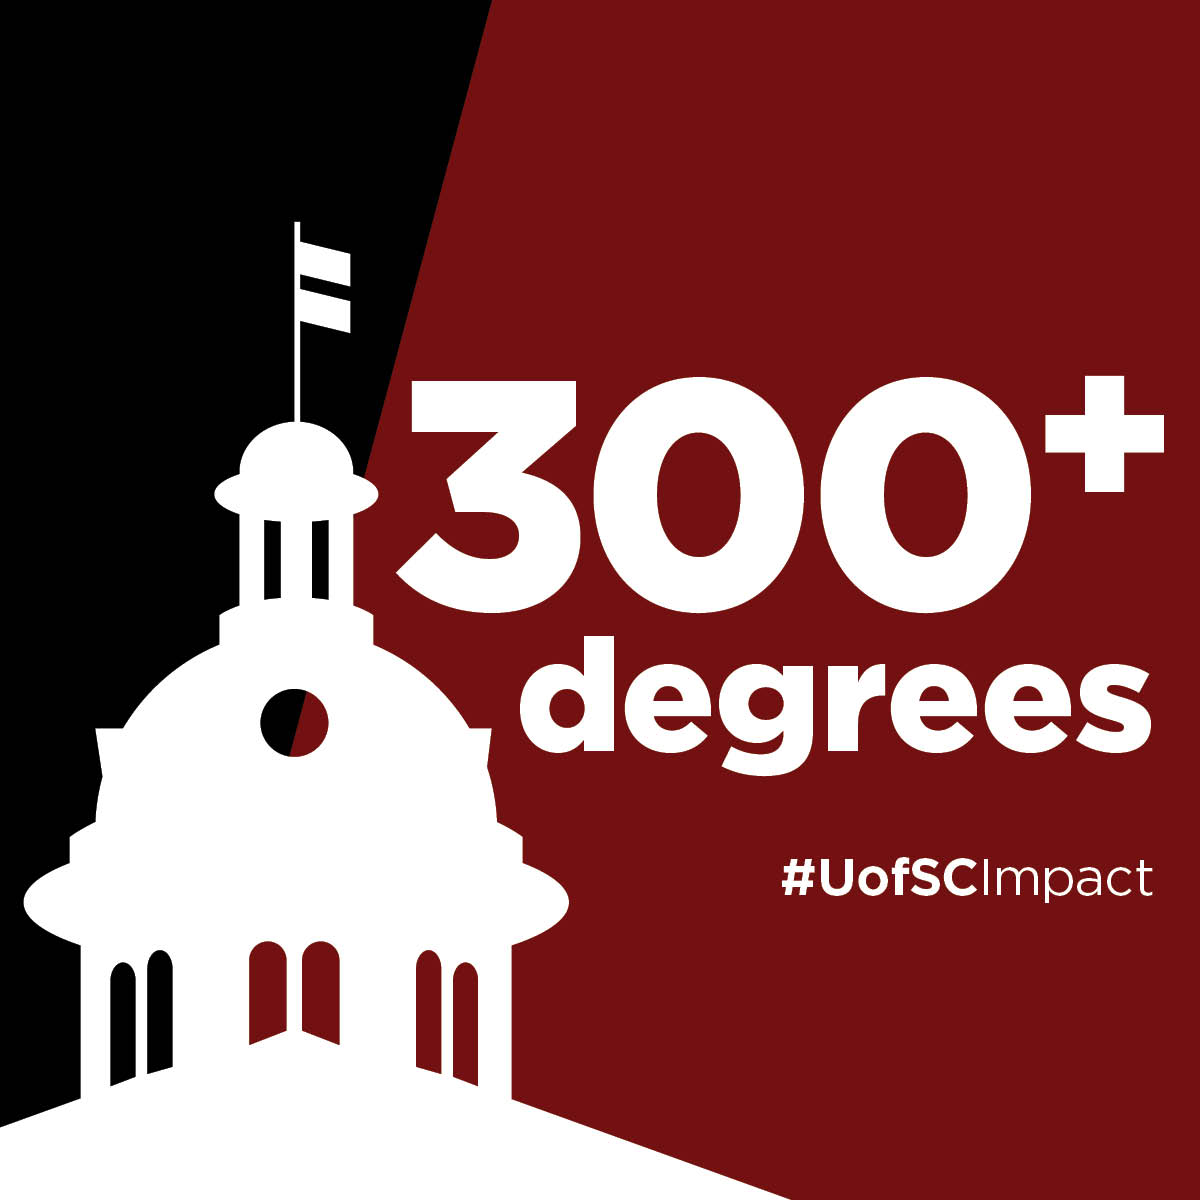 300+ degrees #UofSCImpact